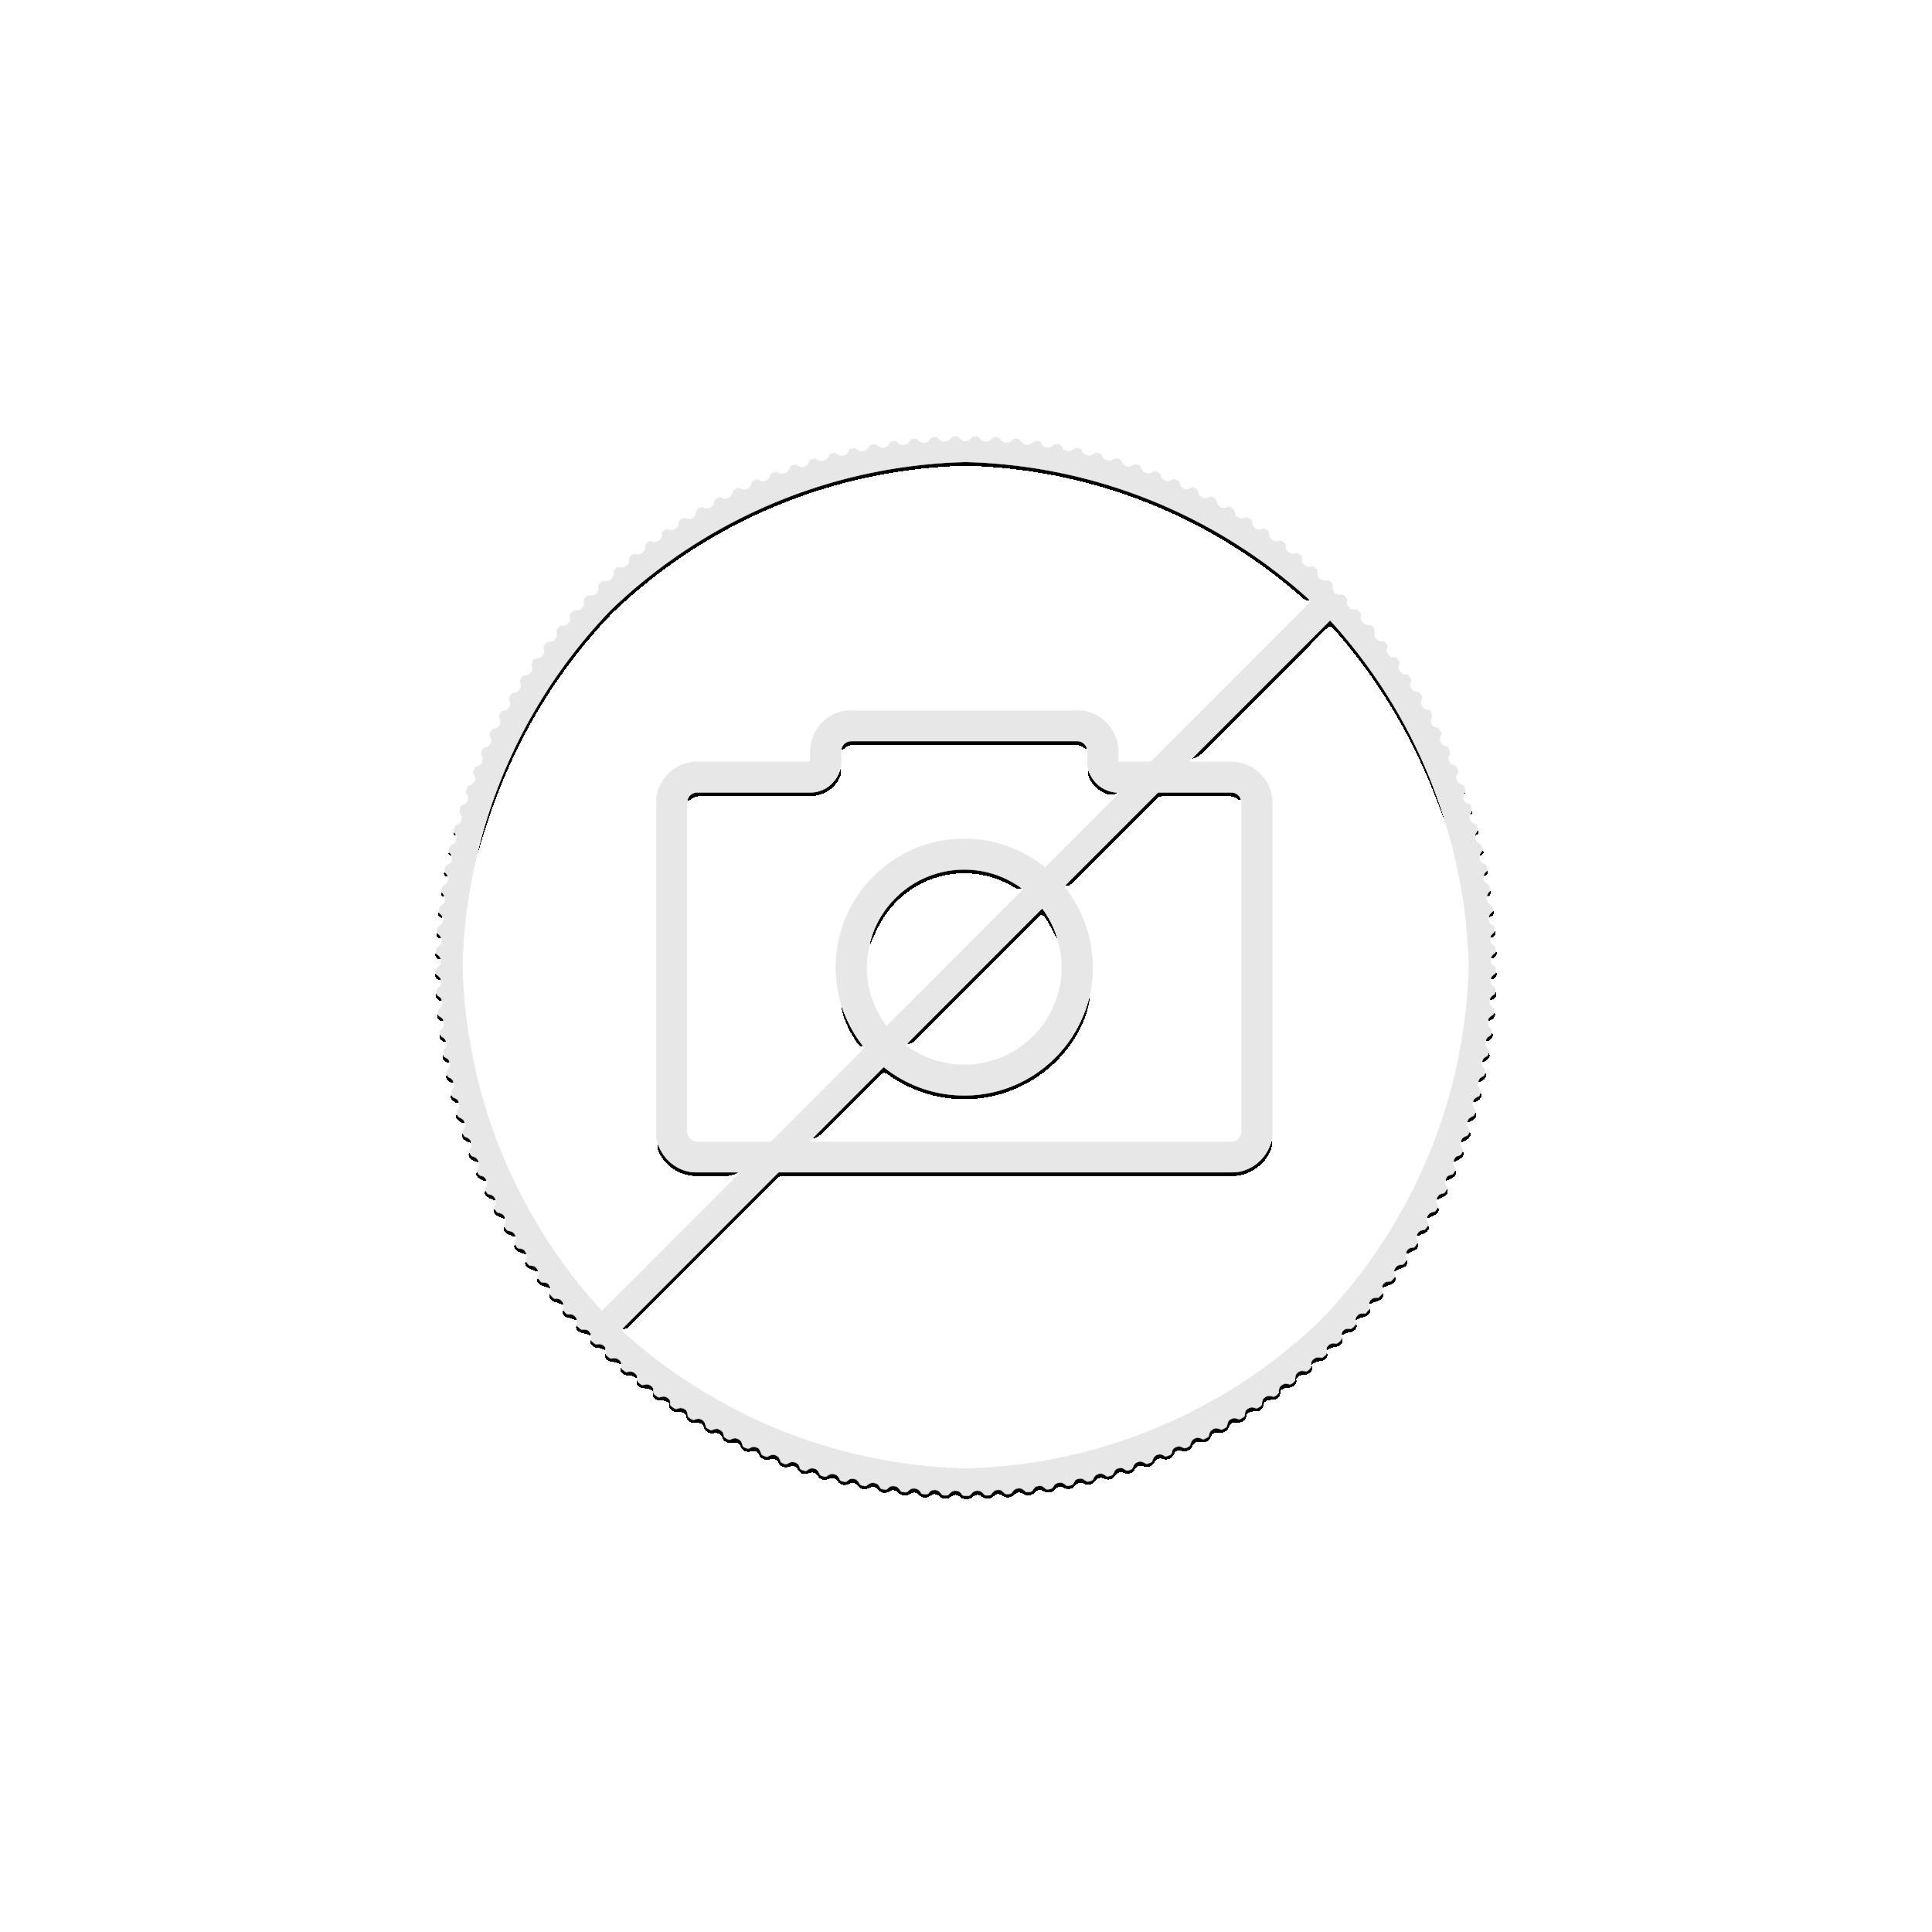 1 Kilo Koala zilver munt 2014